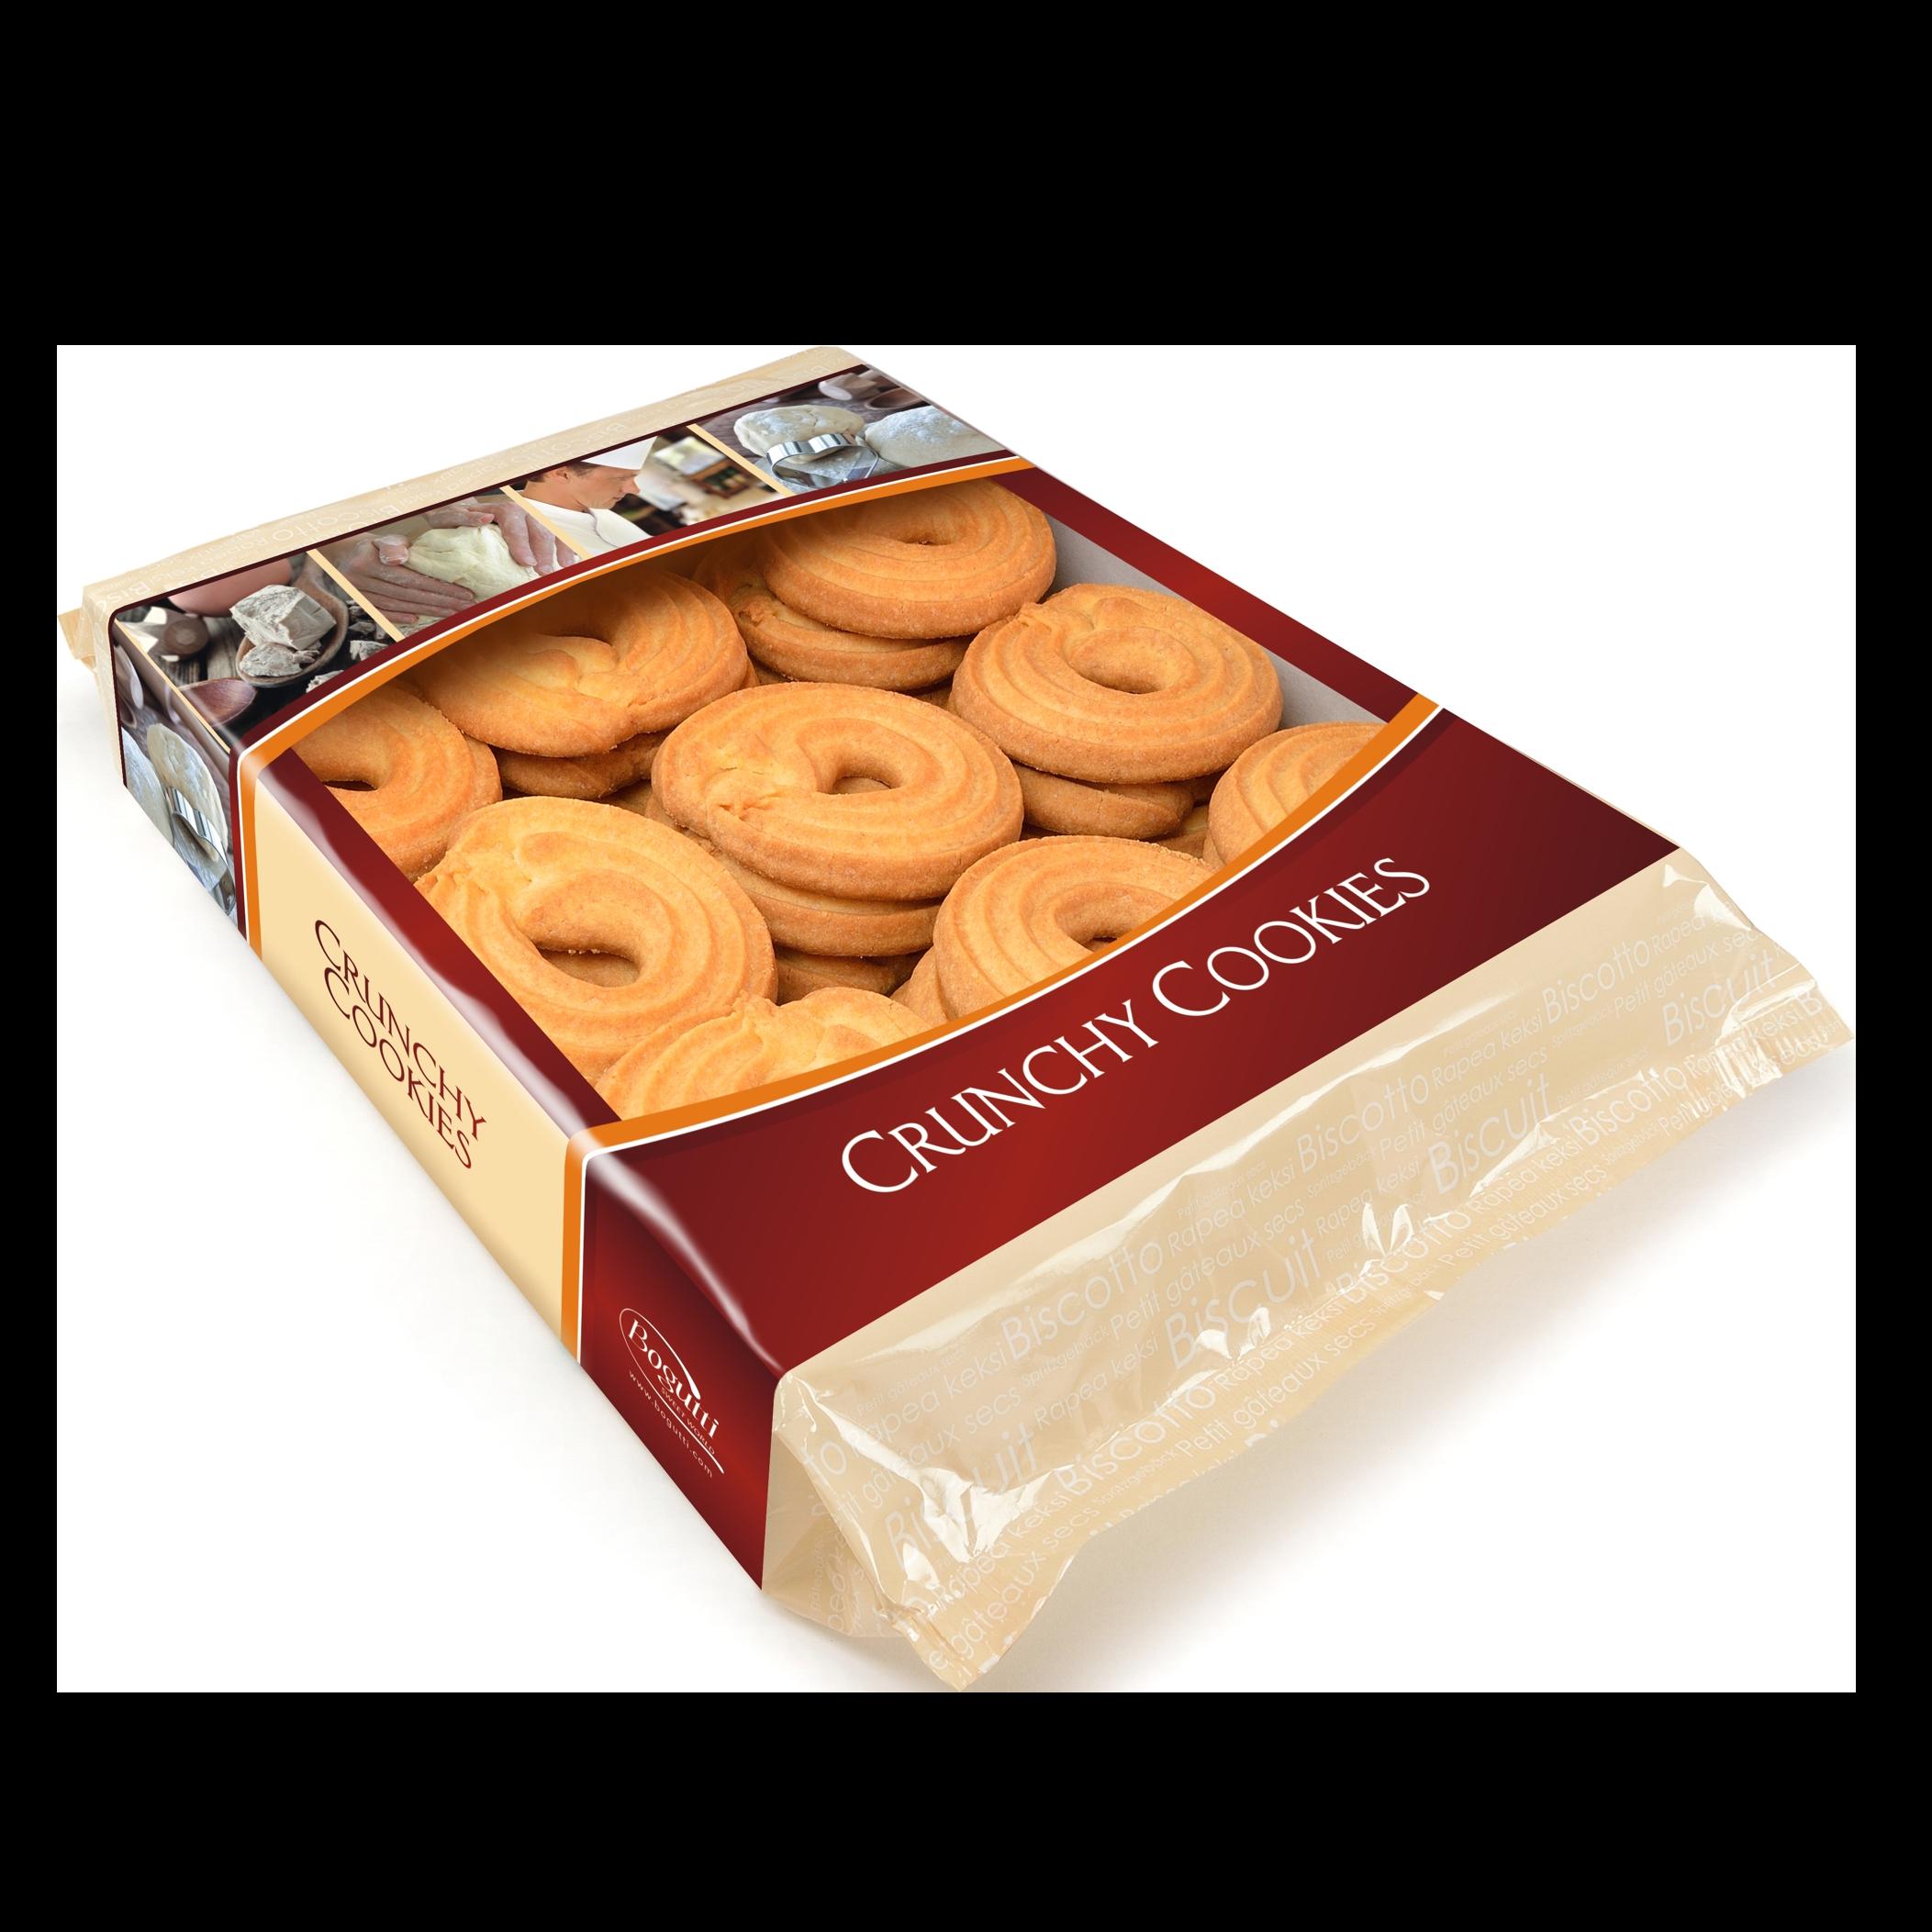 Biscuits croquants au beurre